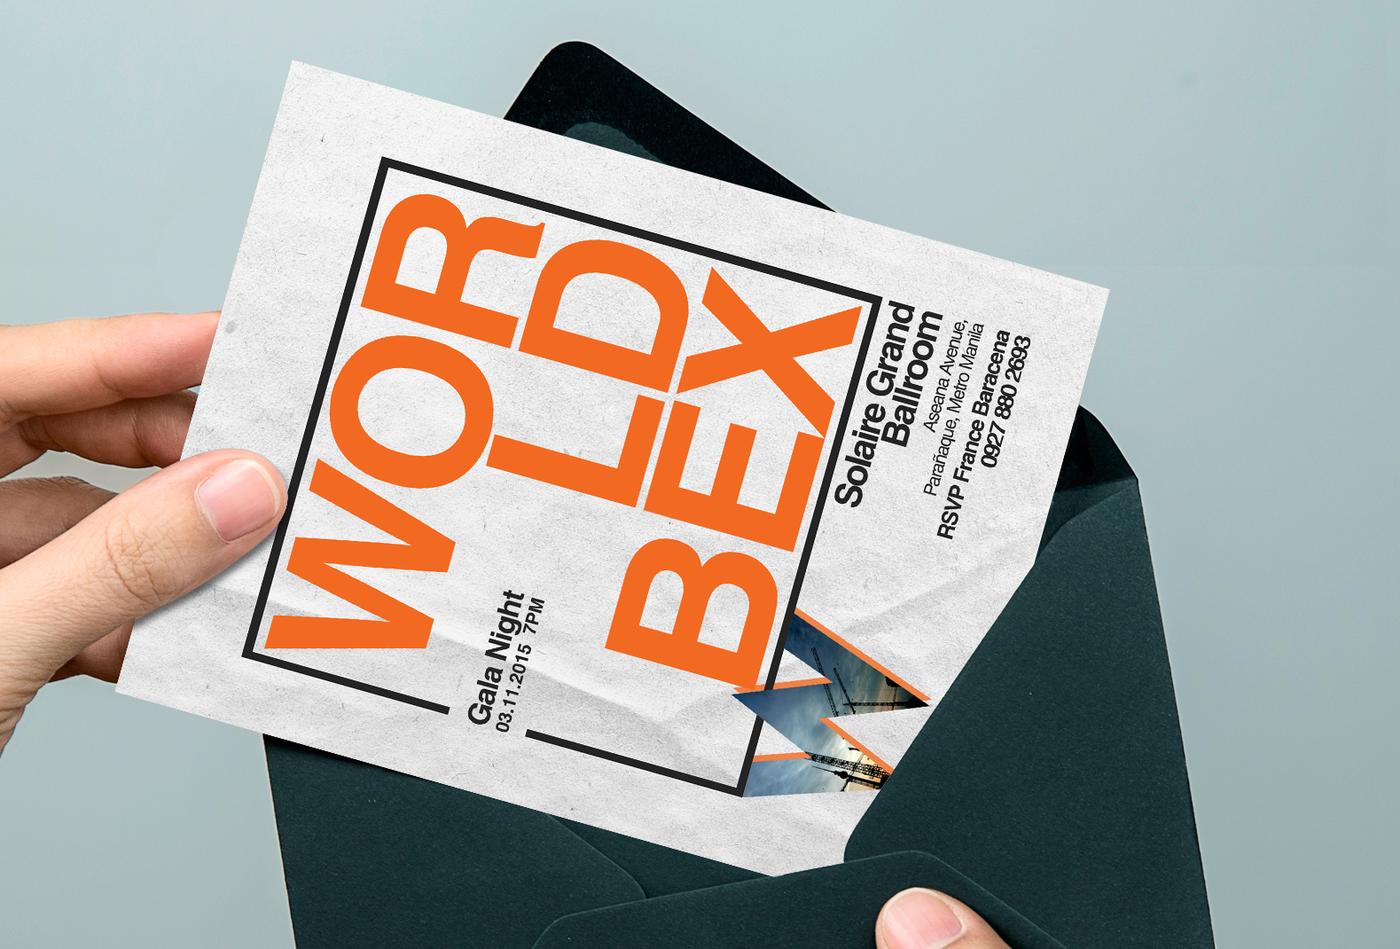 Invitation Design Worldbex Gala Night By Karina So At Coroflot Com